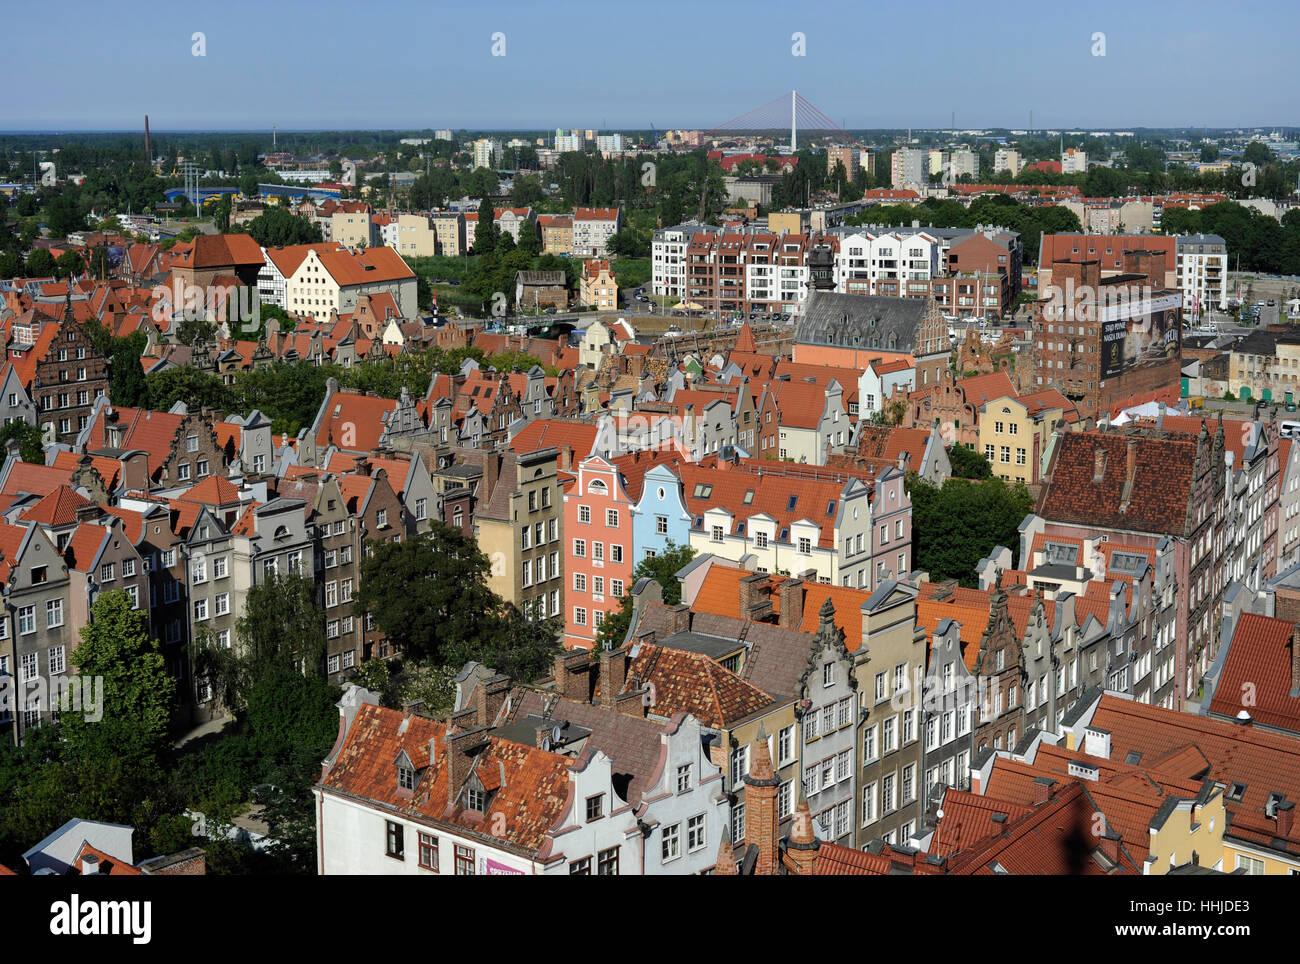 Polonia. Gdansk. Centro Histórico. Imagen De Stock